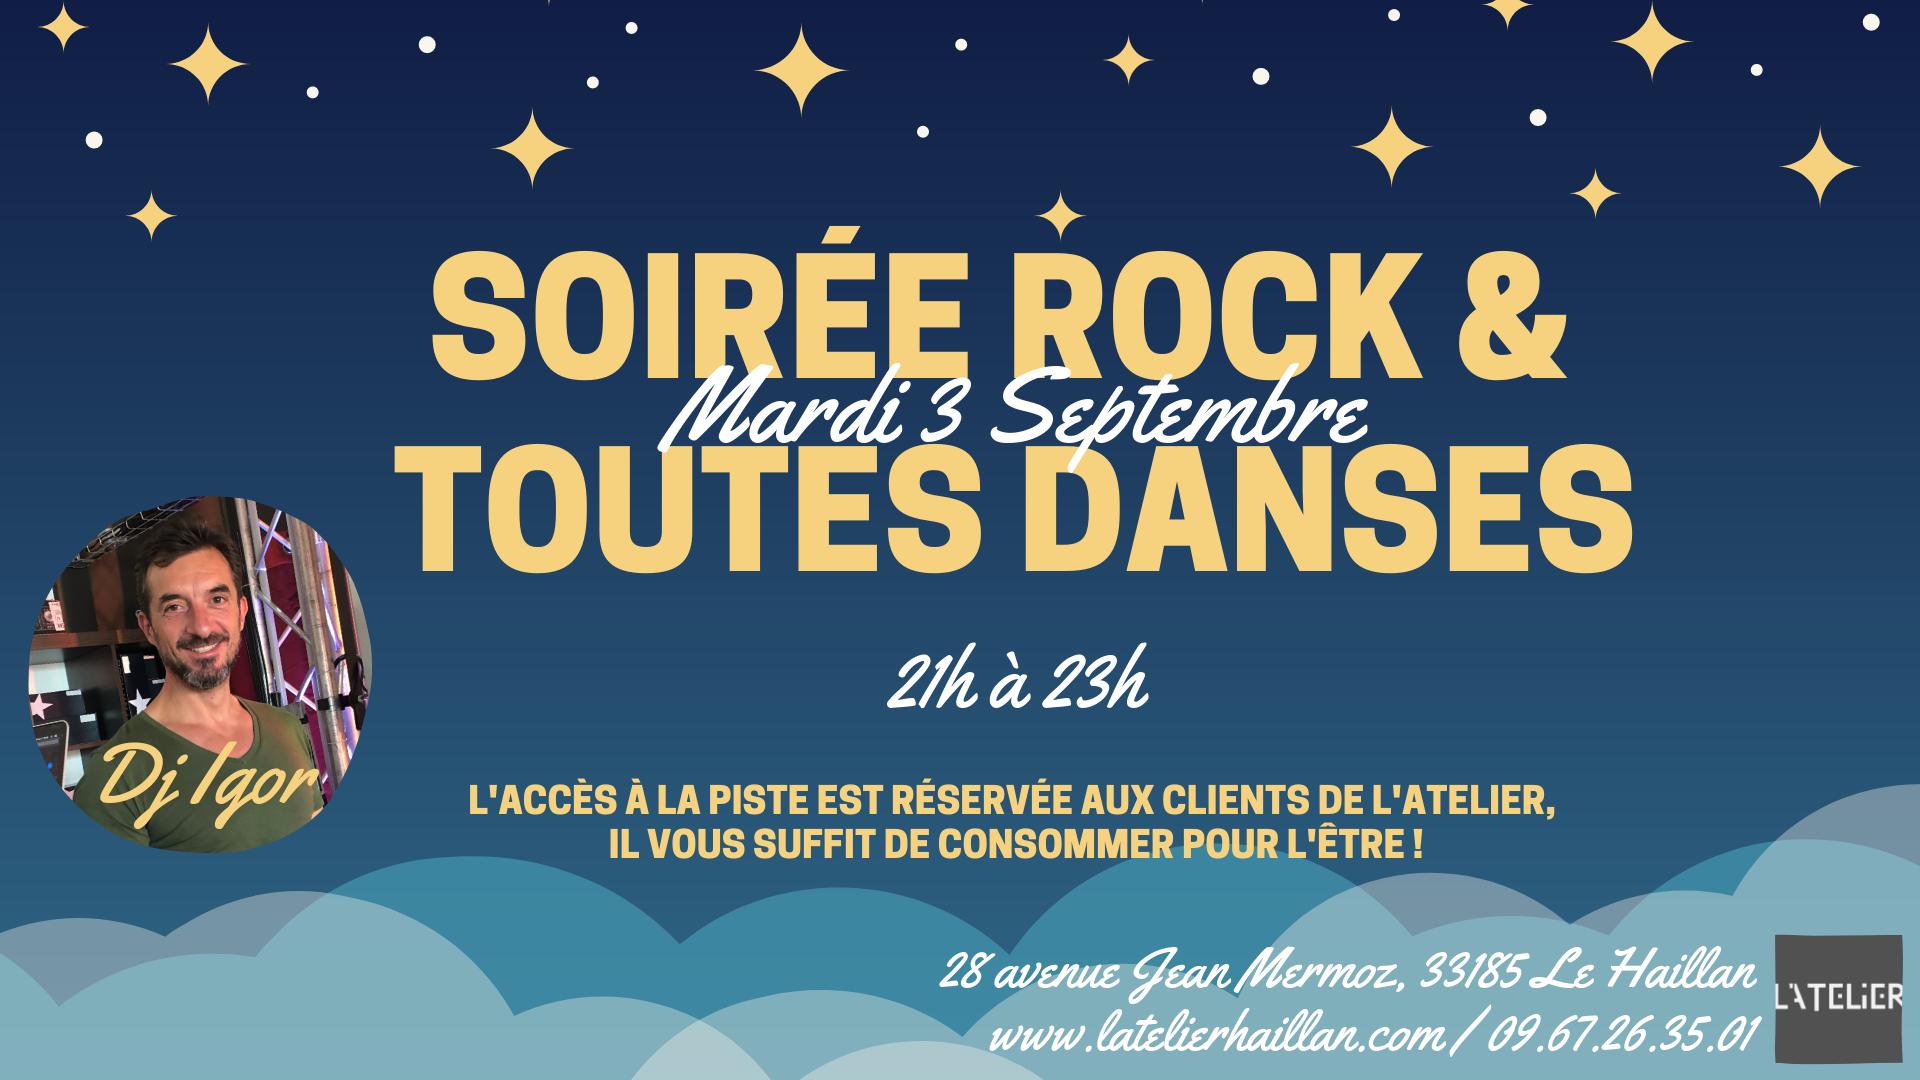 Les Mardis Rock & Toutes Danses avec Igor